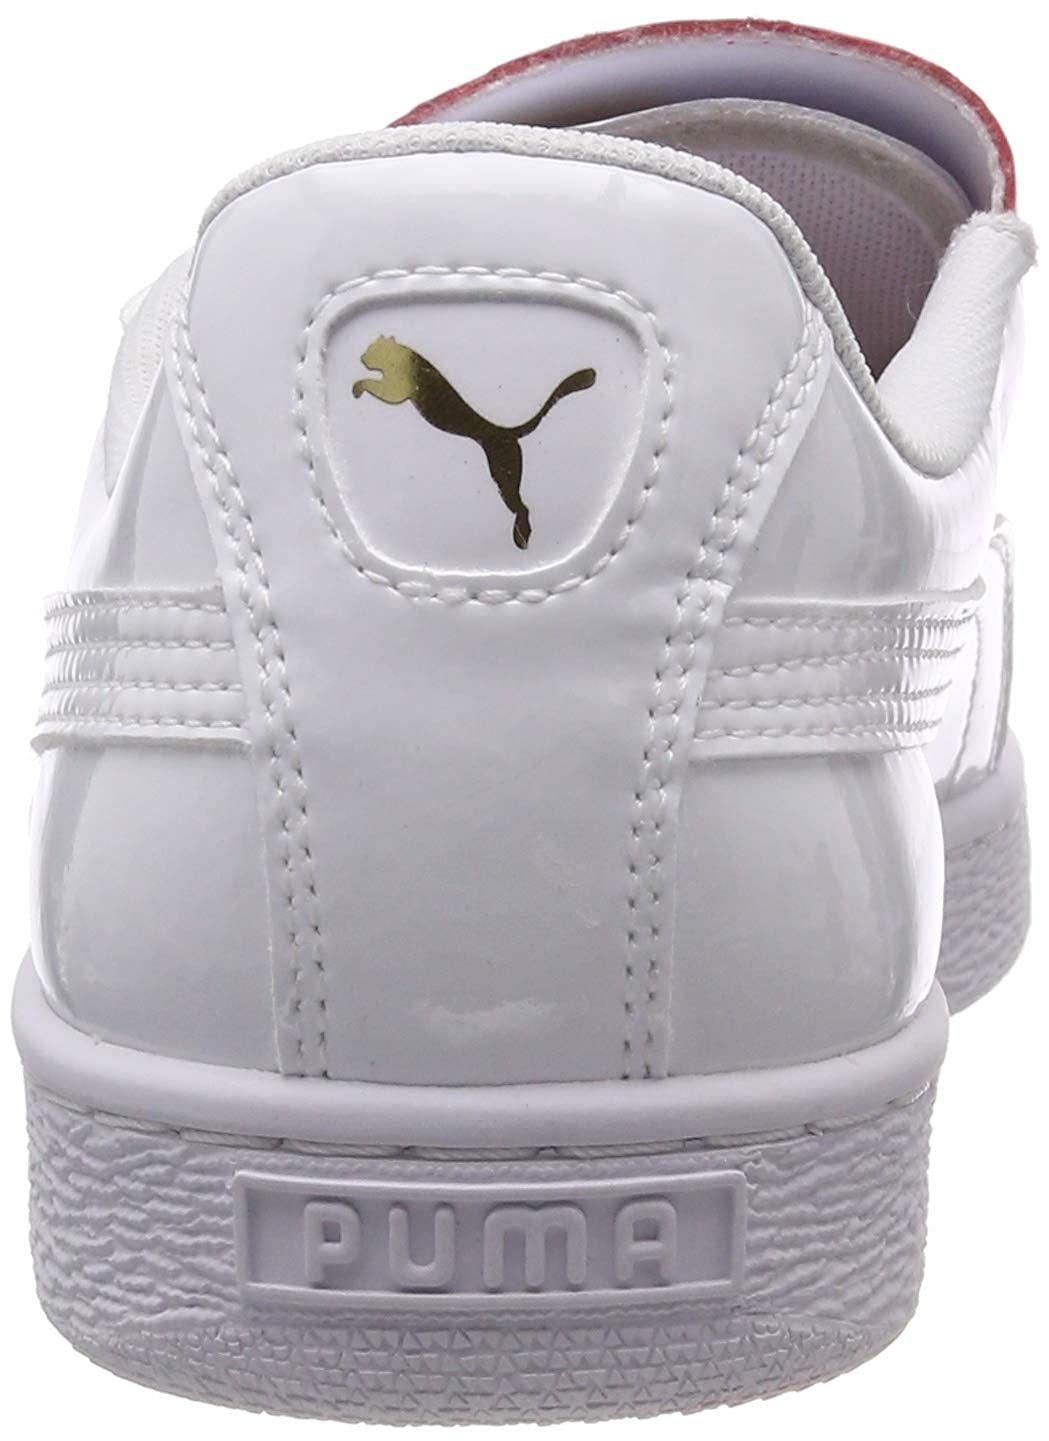 quality design 76060 8ac62 Puma Basket Crush Wn s, Sneakers Basses Femme  Amazon.fr  Chaussures et Sacs